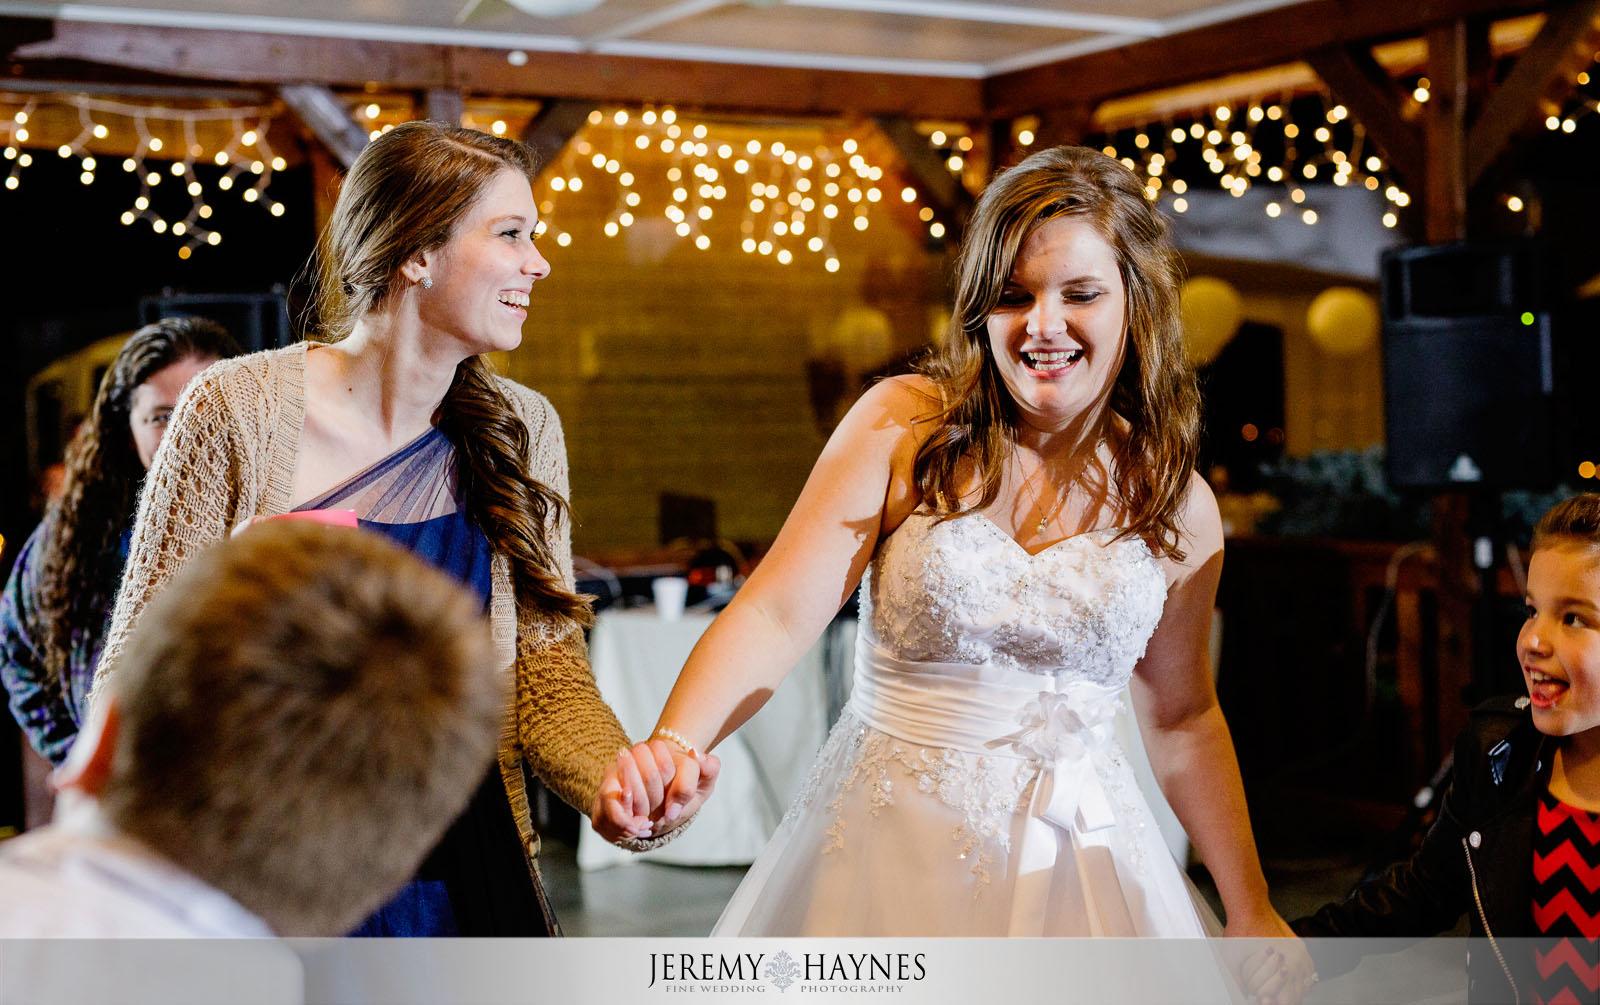 fun-wedding-reception-dance-pictures-jeremy-haynes-photography-avon-gardens.jpg